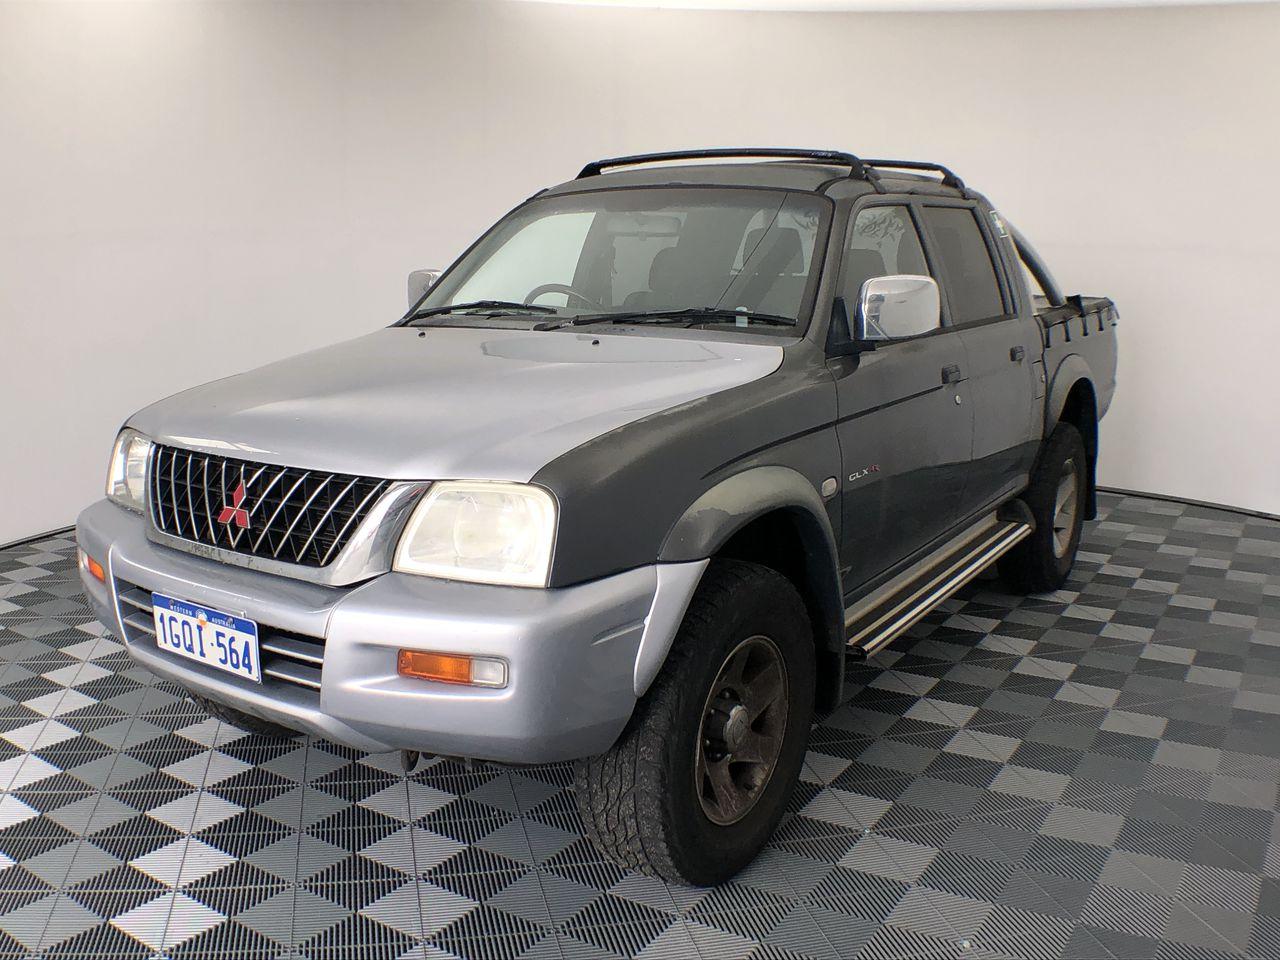 2005 Mitsubishi Triton GLX-R (4x4) MK Automatic Dual Cab (WOVR- Inspected)